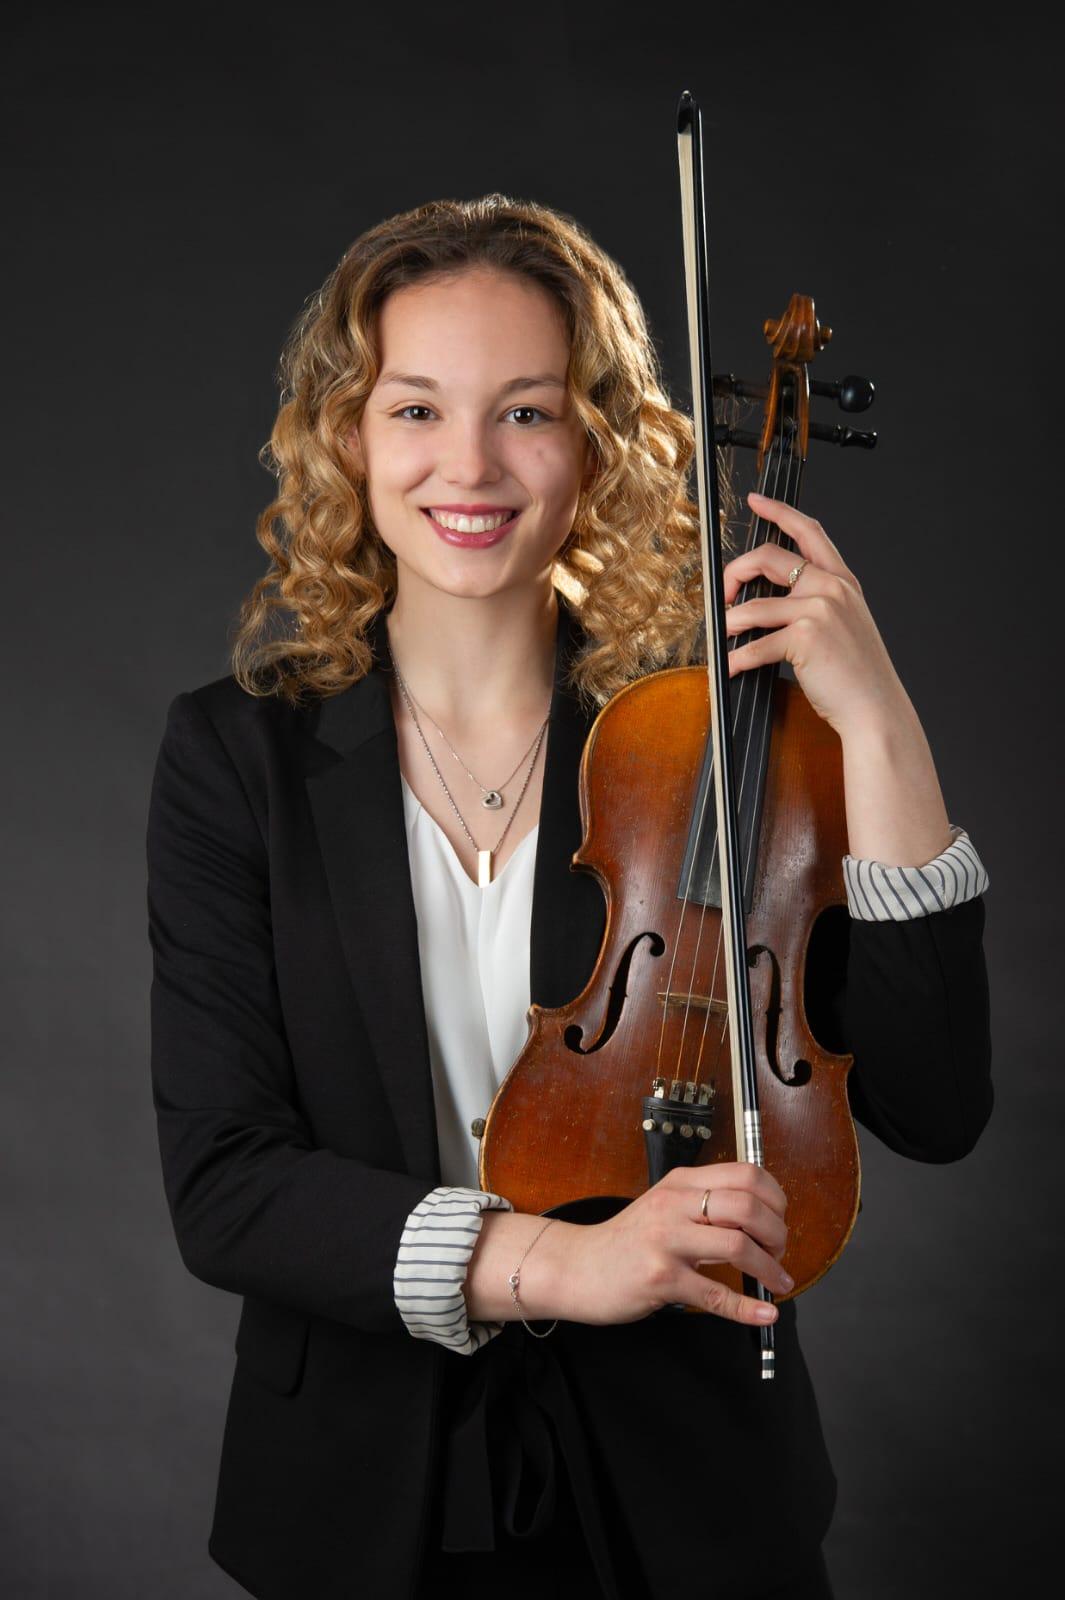 Anton-Brunner-Musikpreisträger 2021: Emely-Anabel Exner